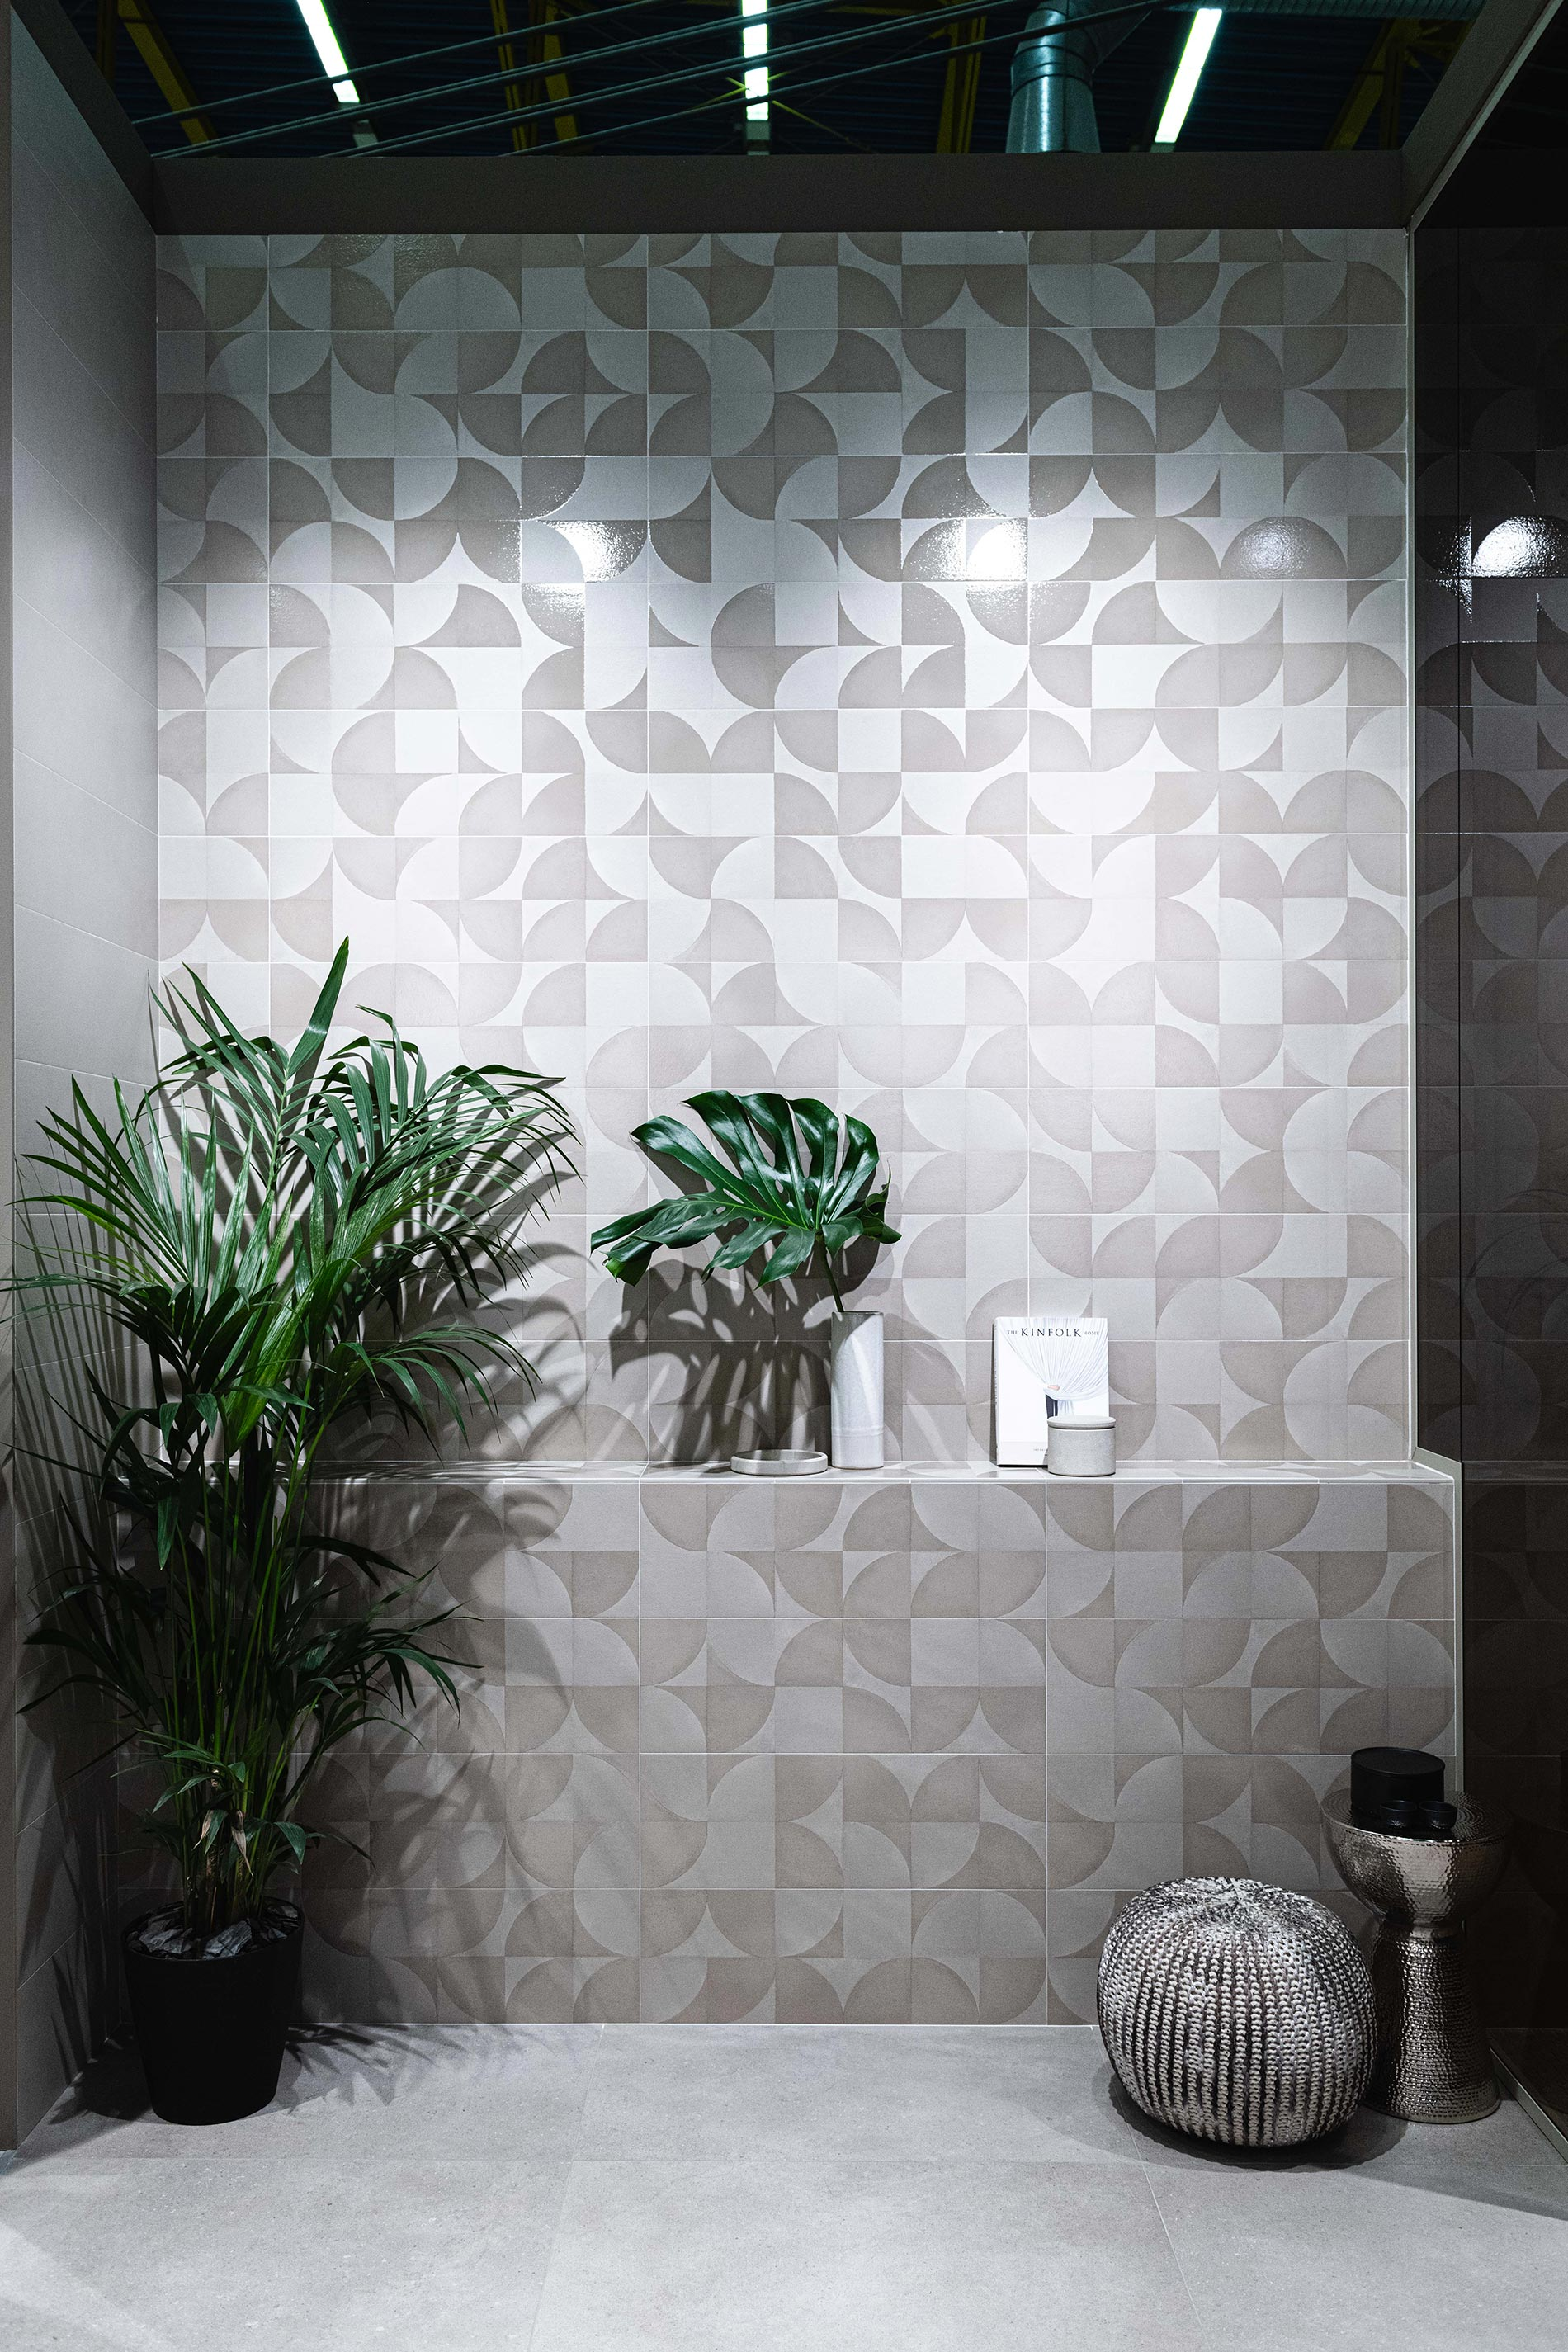 piastrelle in pasta bianca in bagno cersaie 2019 motivo geometrico a parete